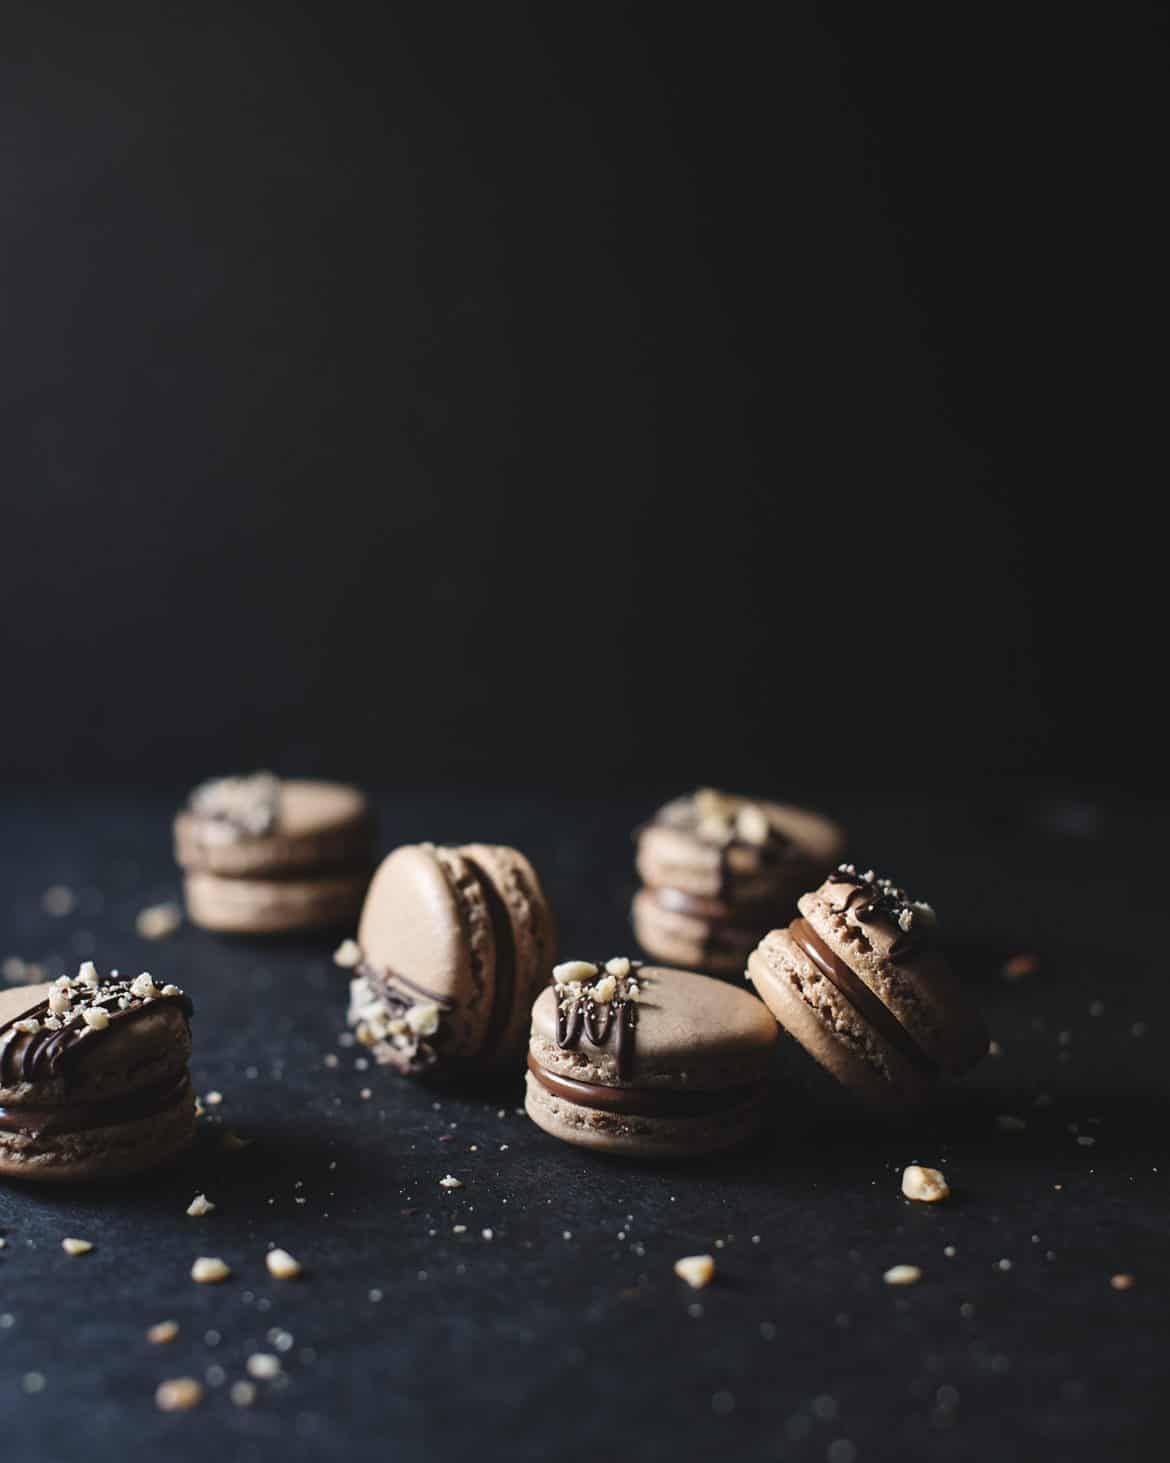 Ferrero rocher macarons recipe macarons chocolate